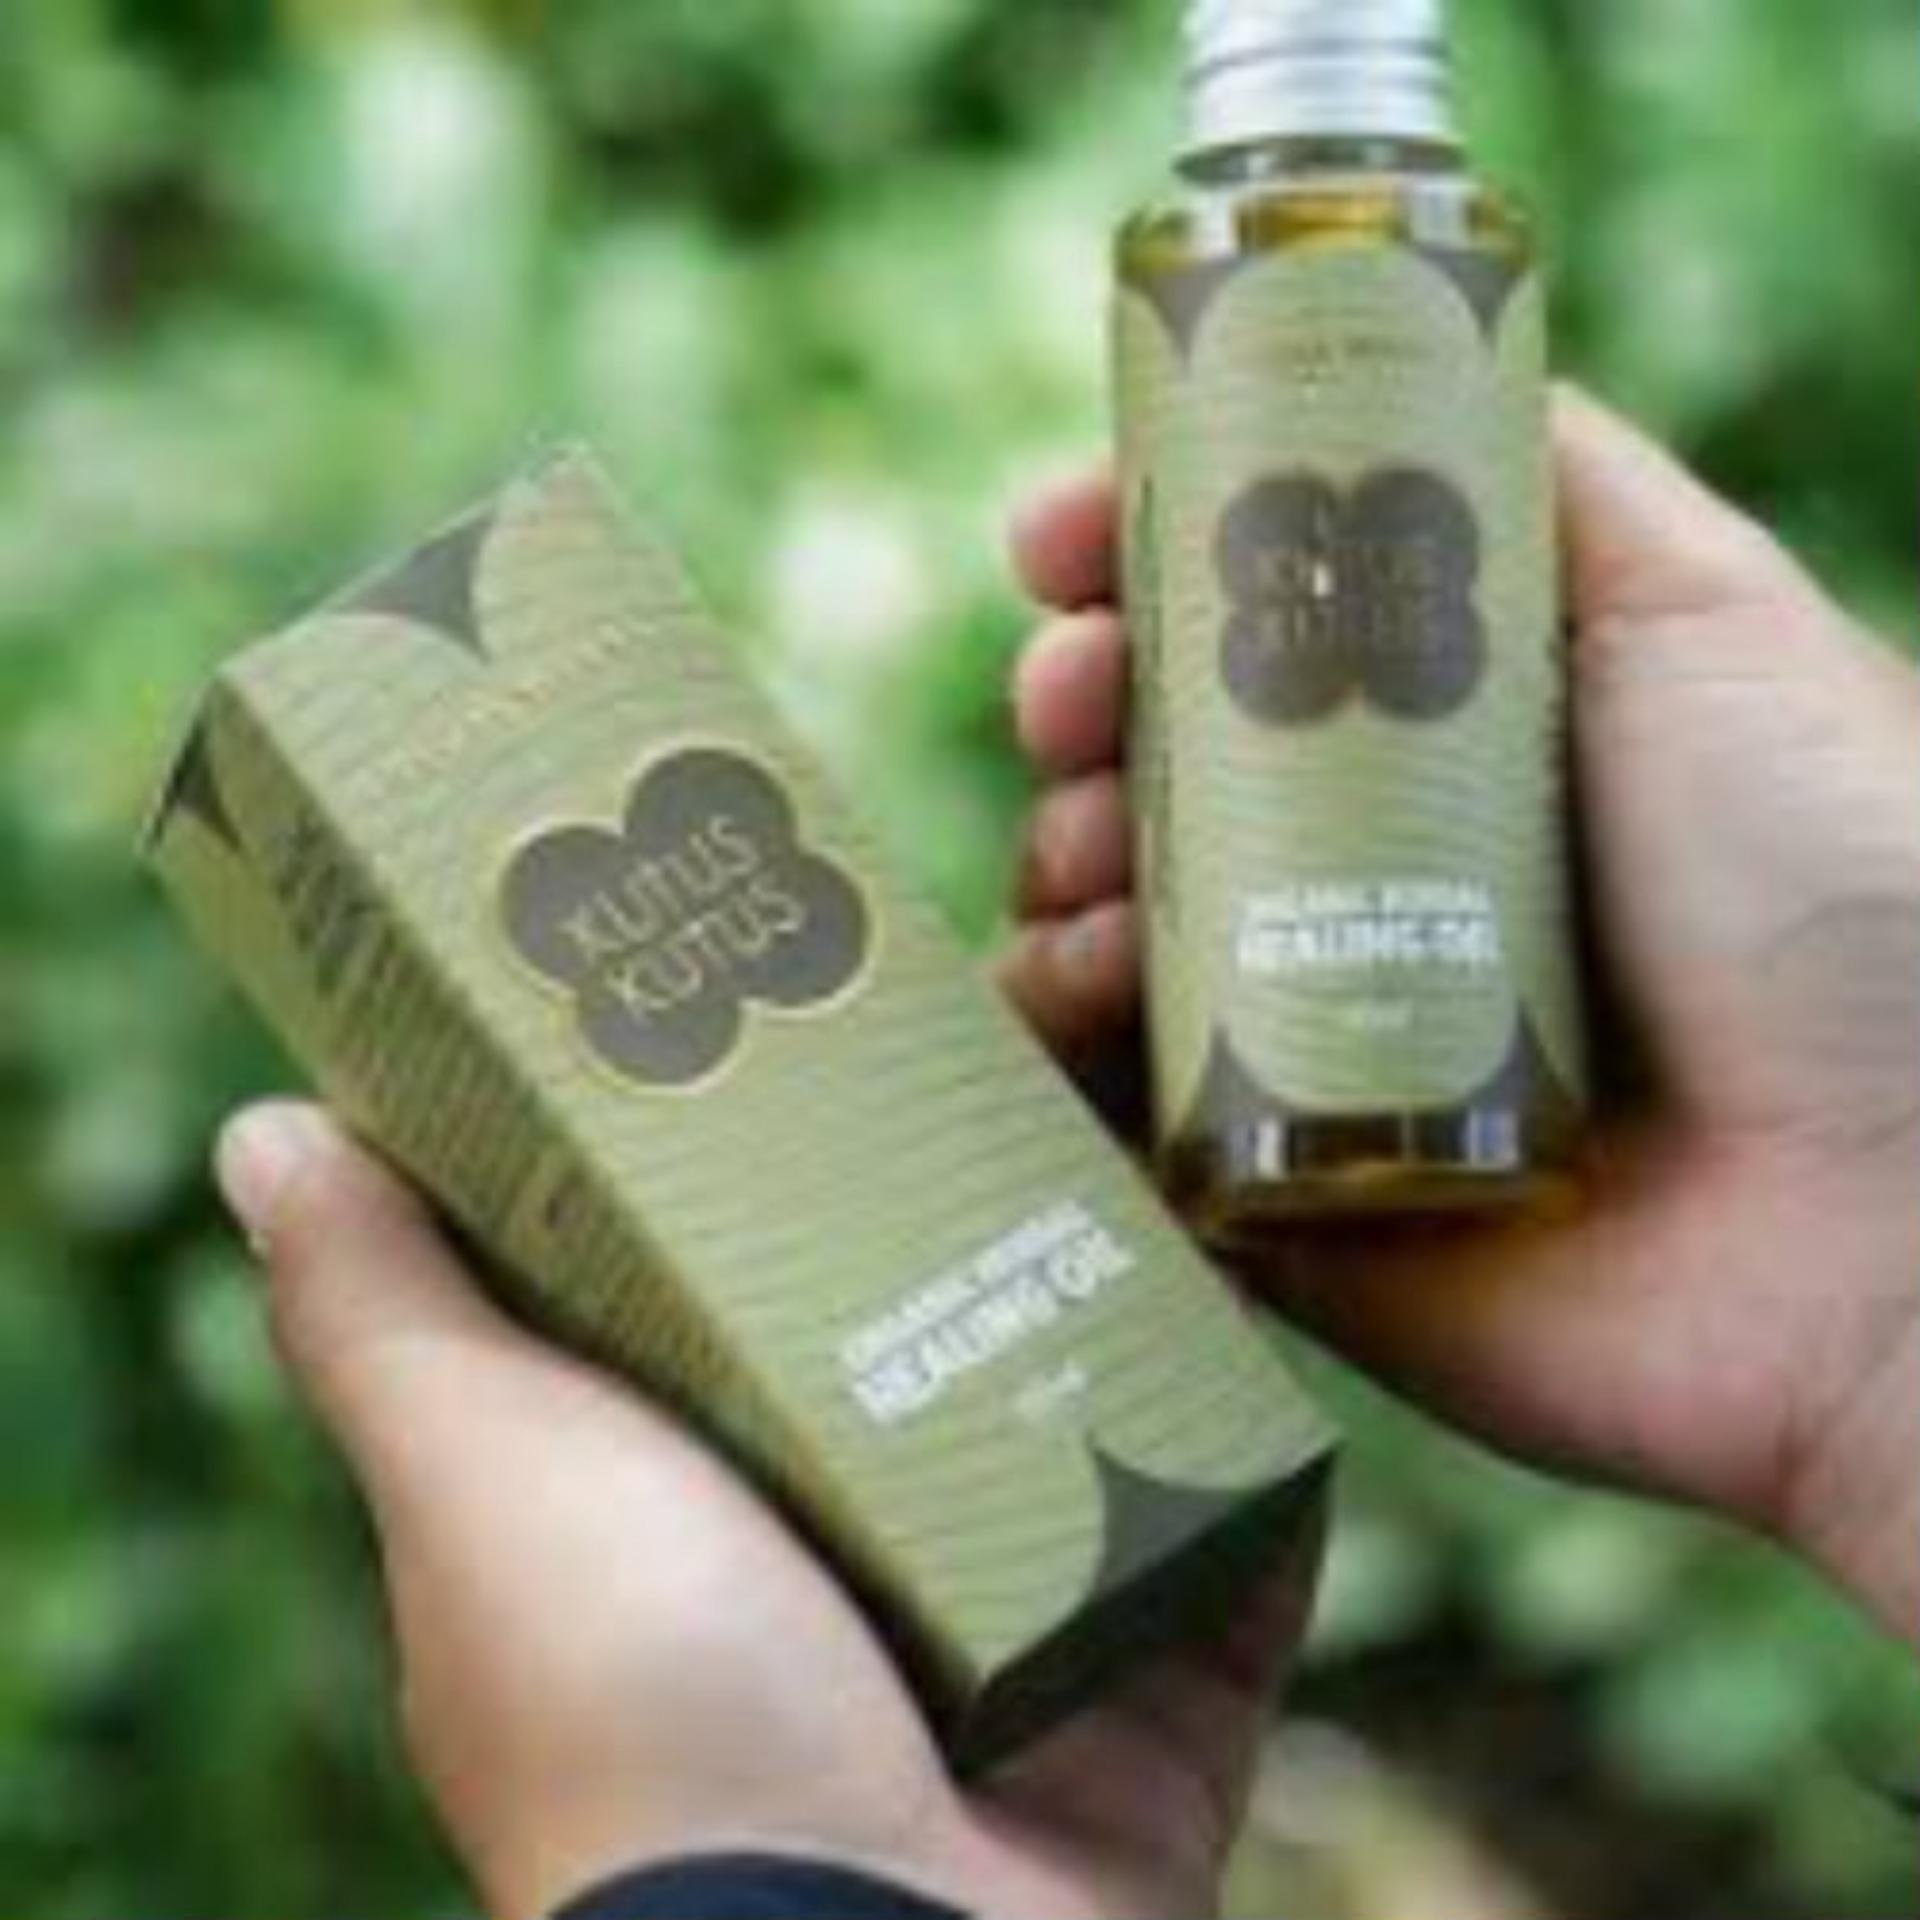 Buy Sell Cheapest Syakara Minyak Kutus Best Quality Product Deals Free Brosur Dan Tutup Spray Asli Bali Original